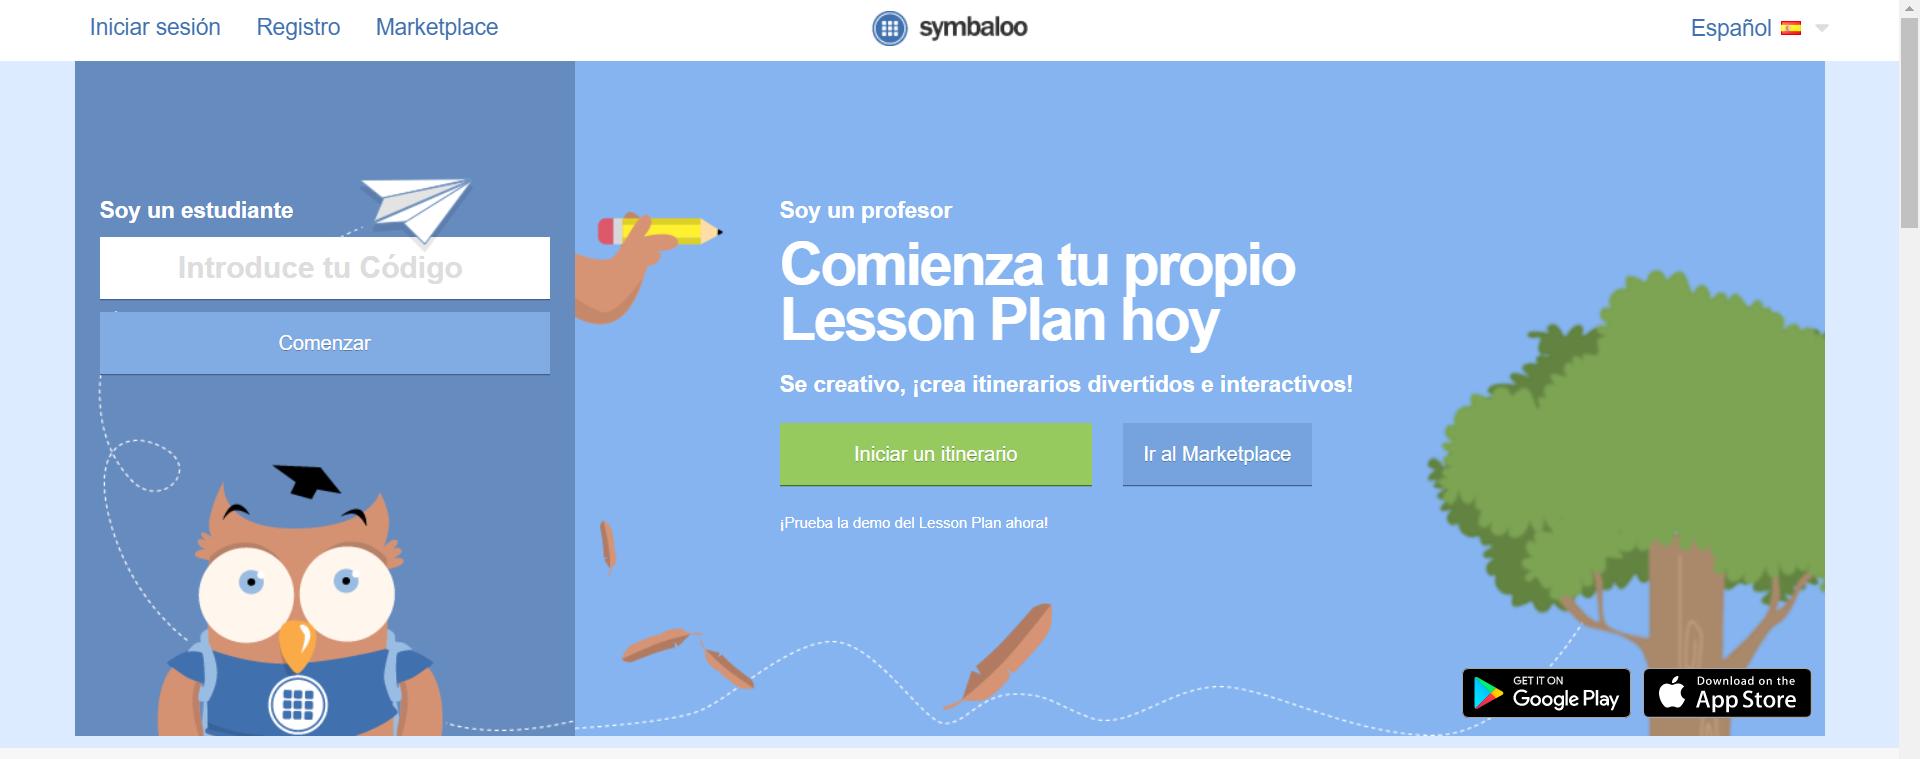 Inicio de Lesson Plan con código.